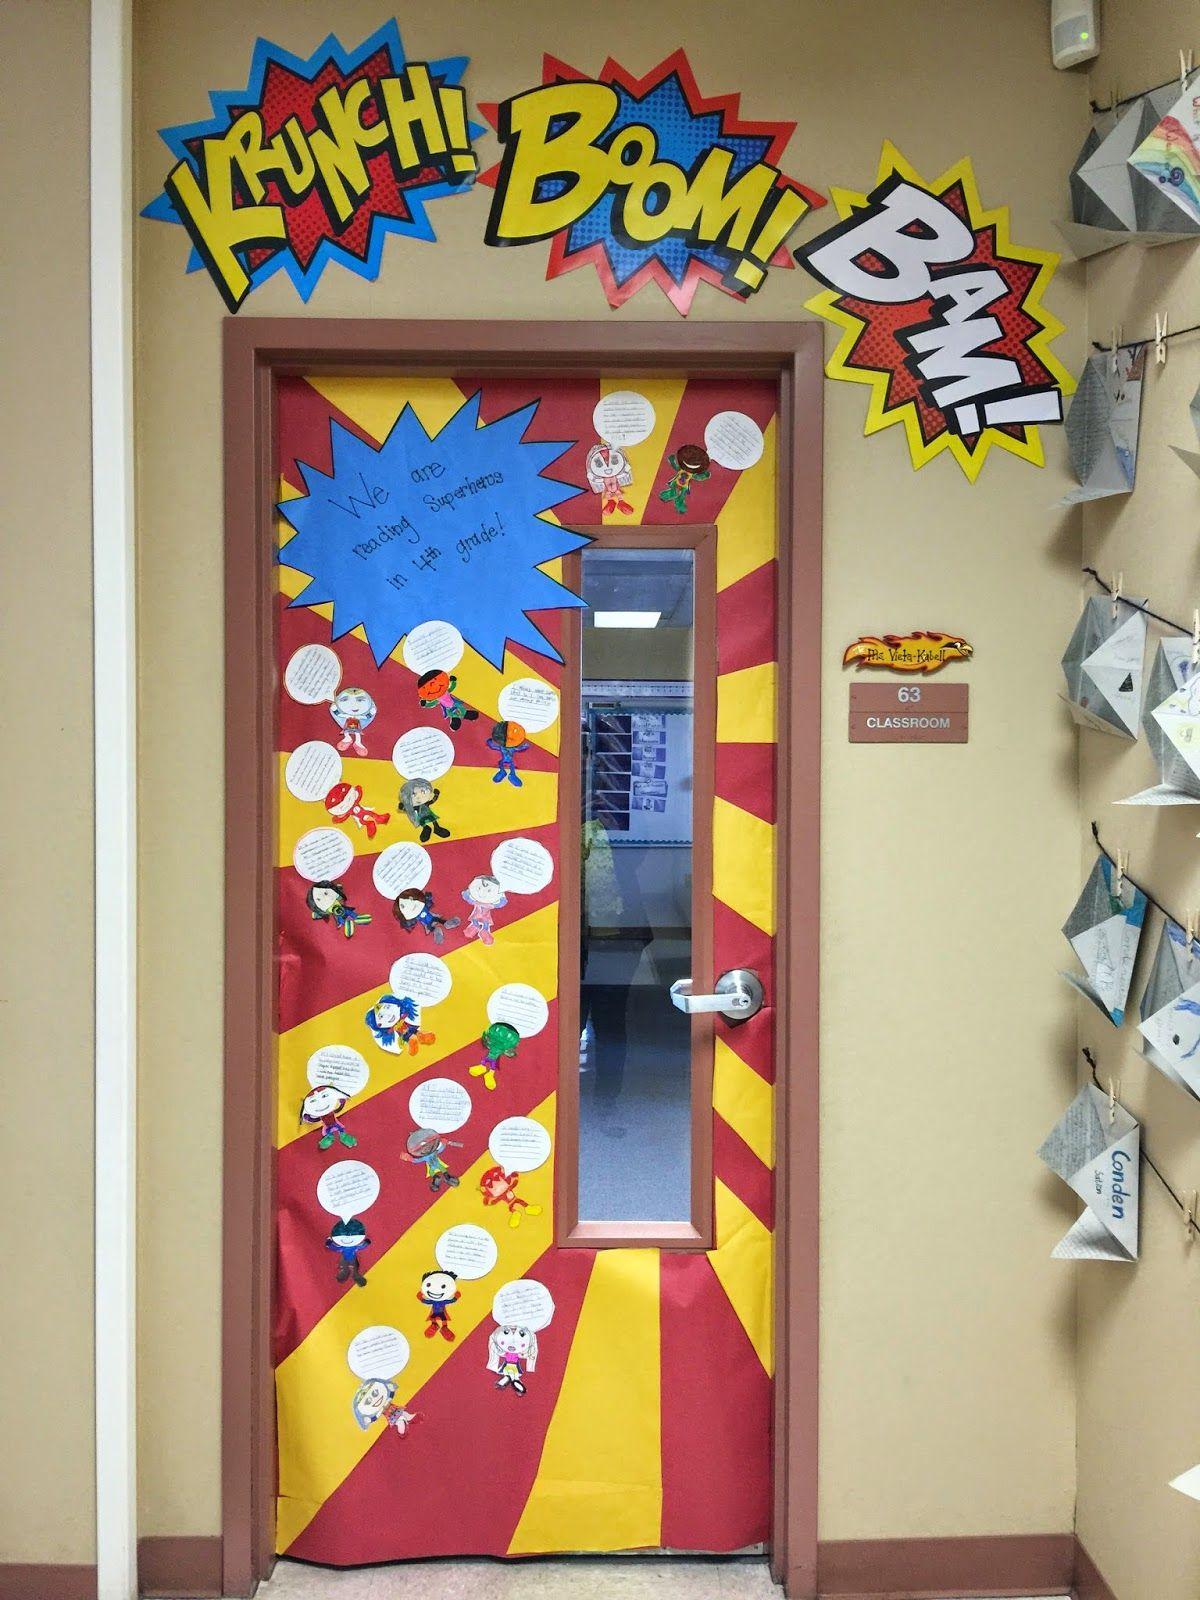 Busy Miss B. Superhero Classroom Doors More & Busy Miss B.: Superhero Classroom Doors \u2026 | Pinteres\u2026